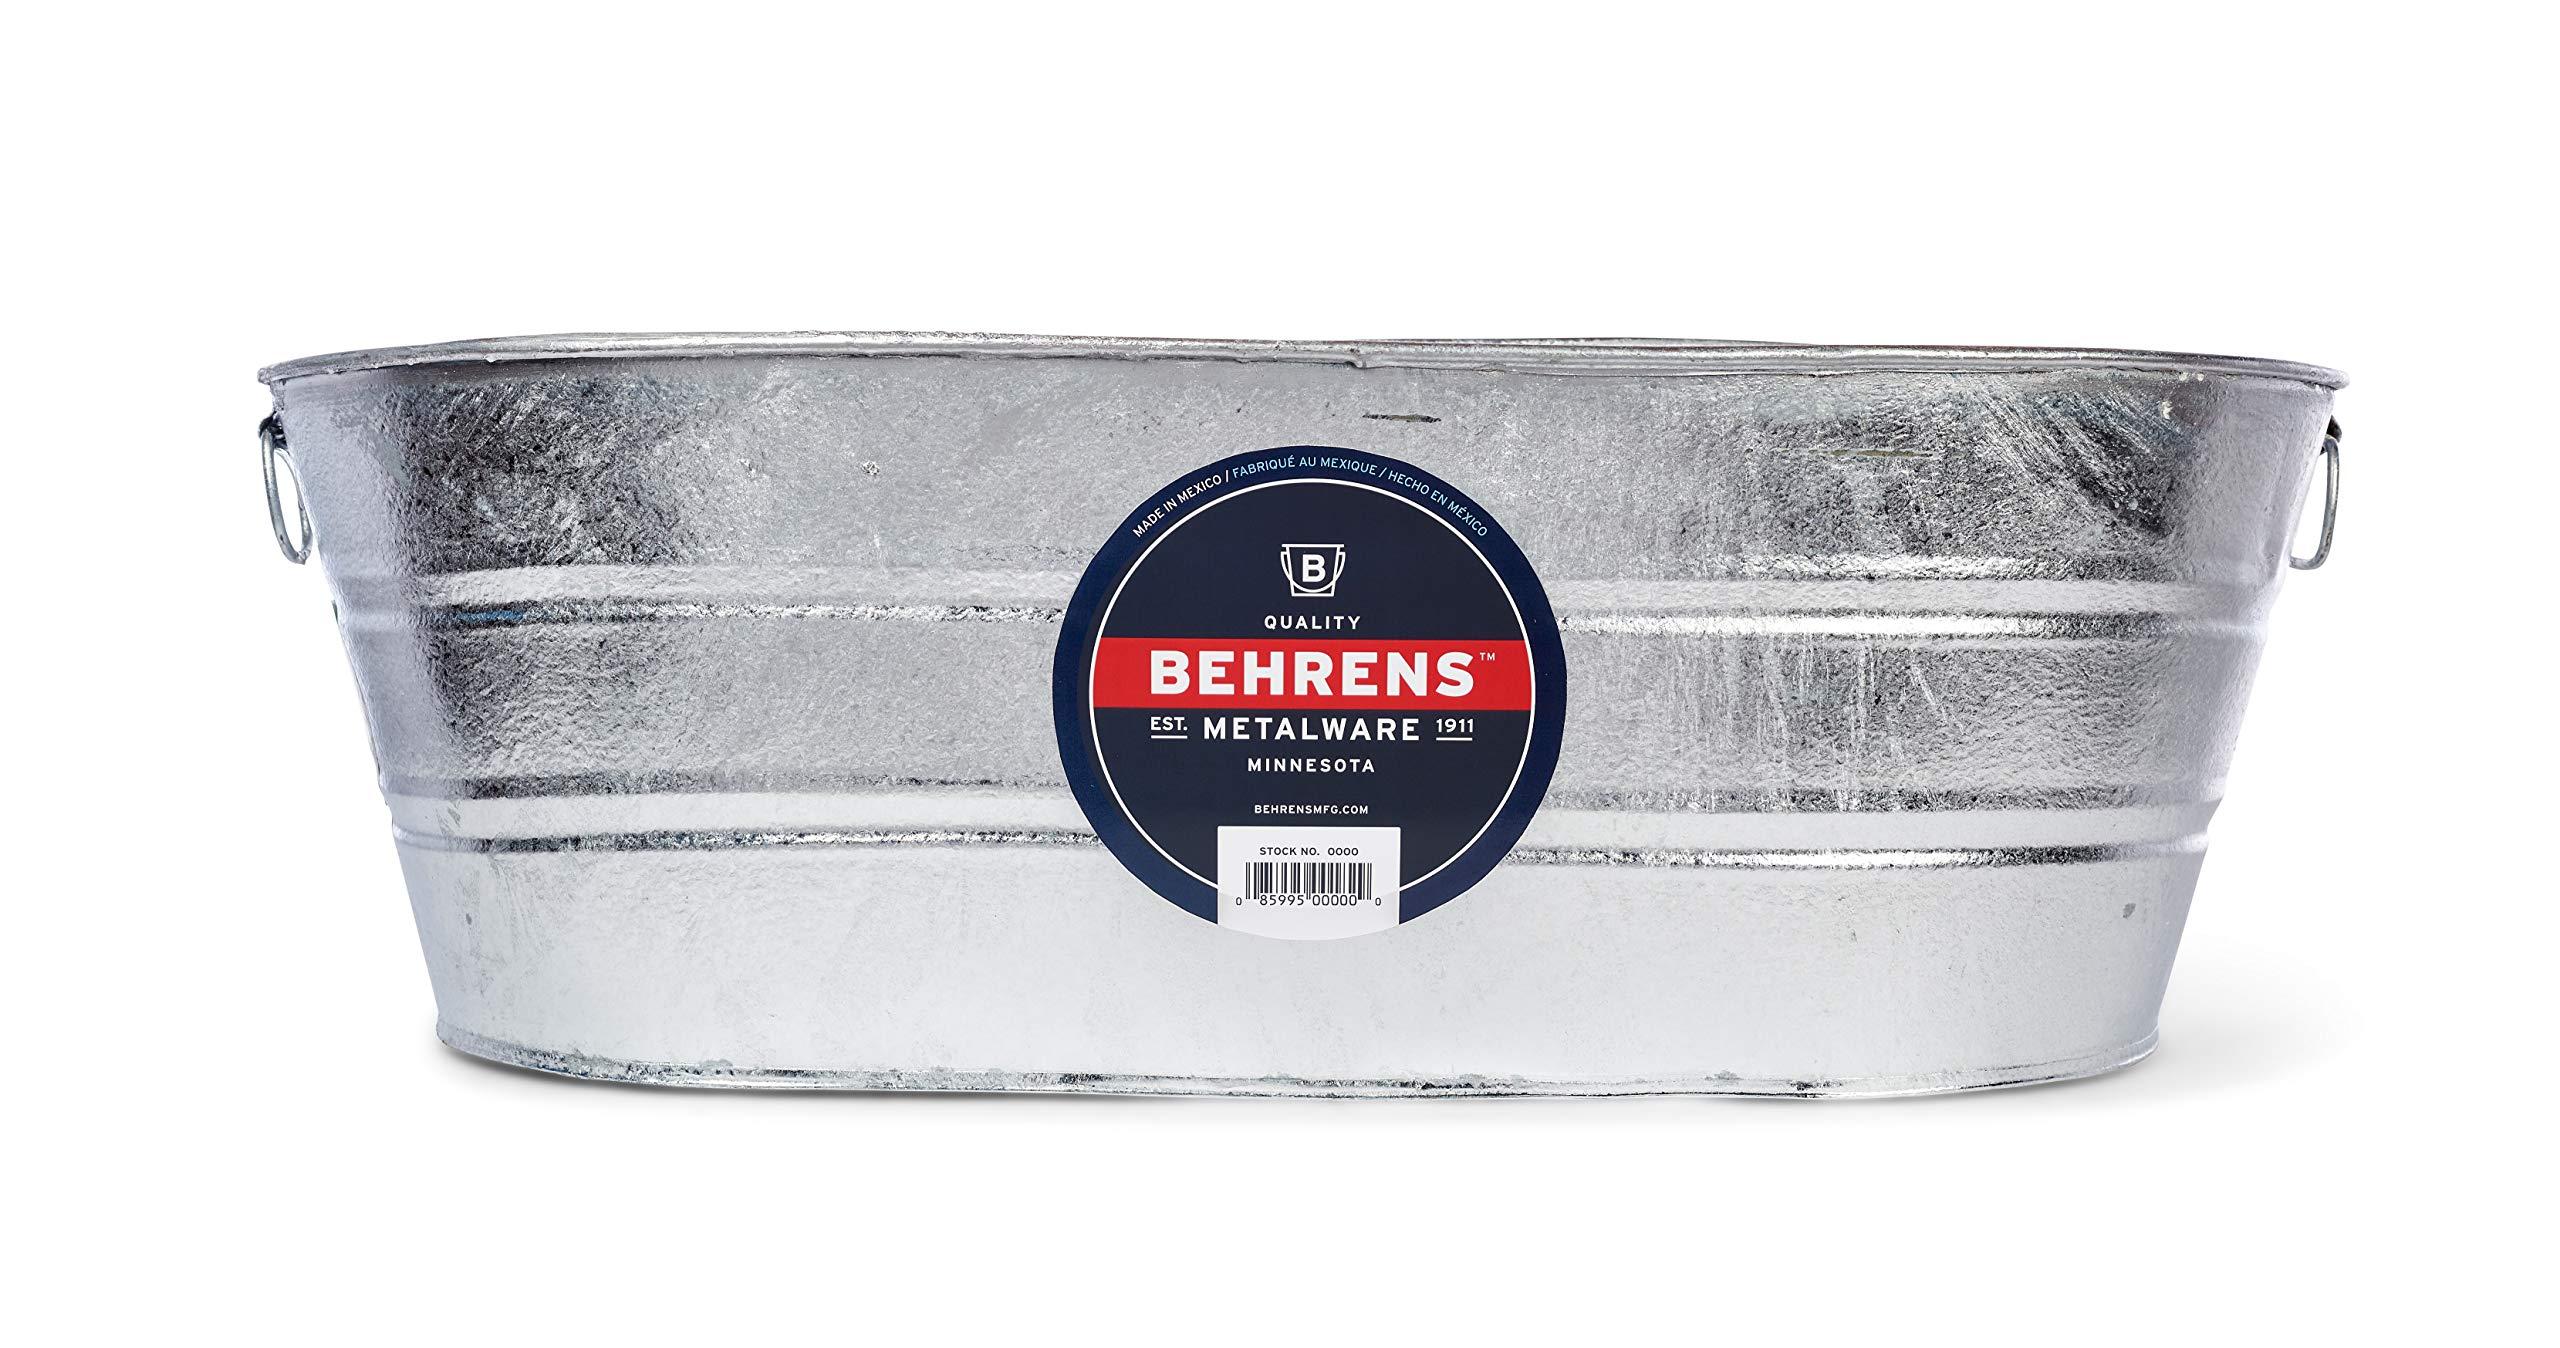 Behrens 3 OV 16 Gallon Oval Steel